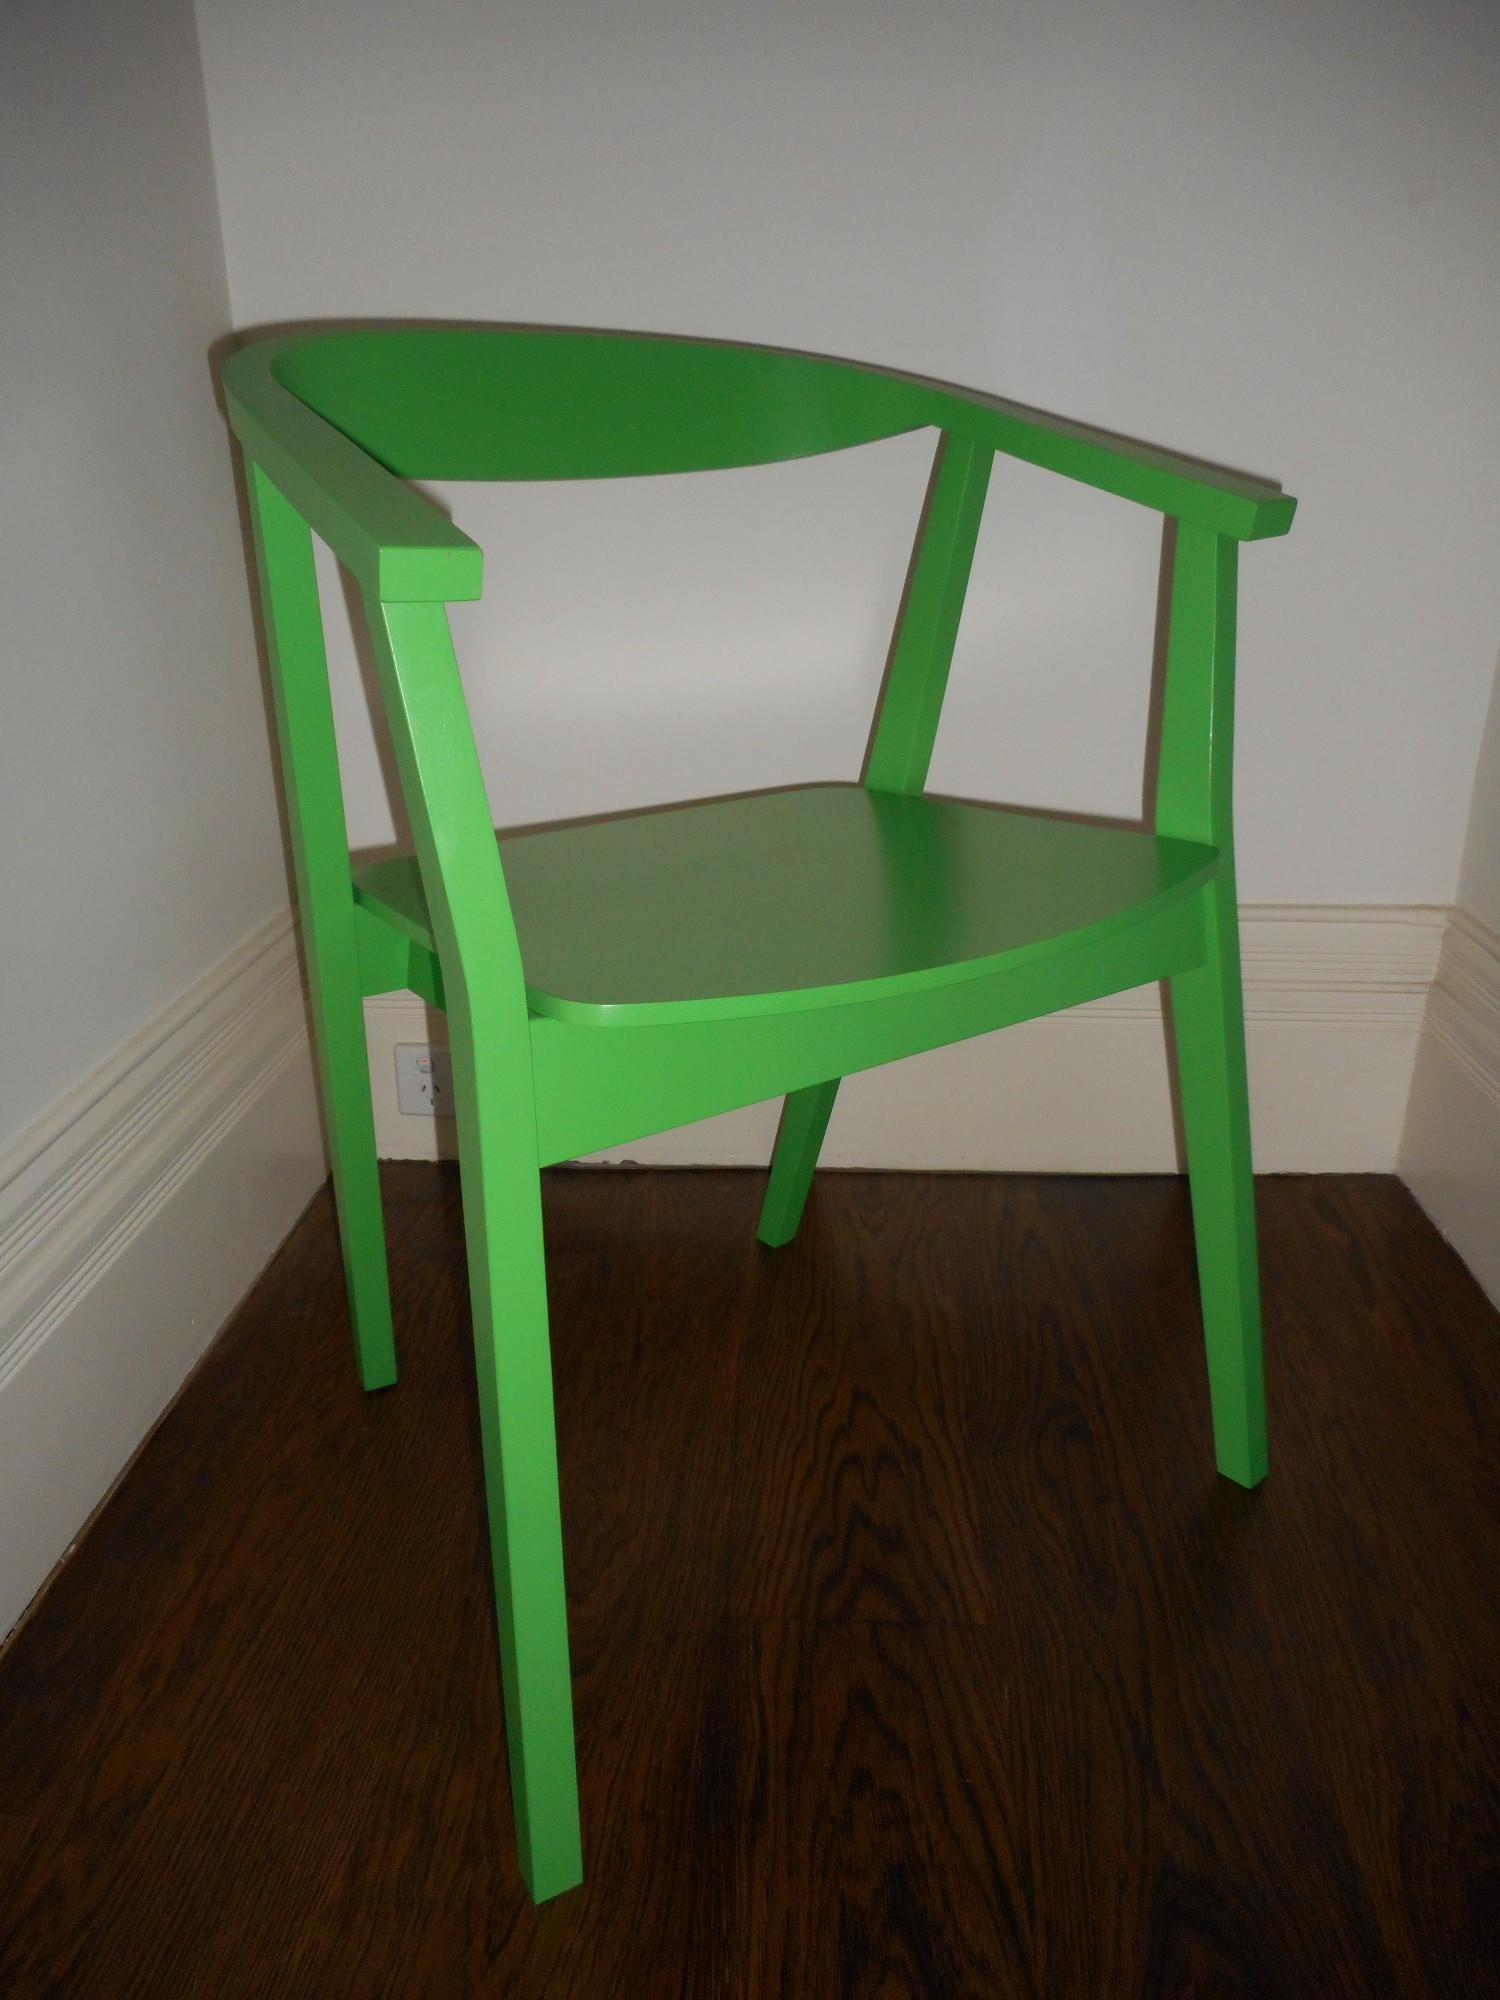 main product image : DSCN0087 e1438086326981 from www.ebay.com.au size 1500 x 2000 jpeg 457kB